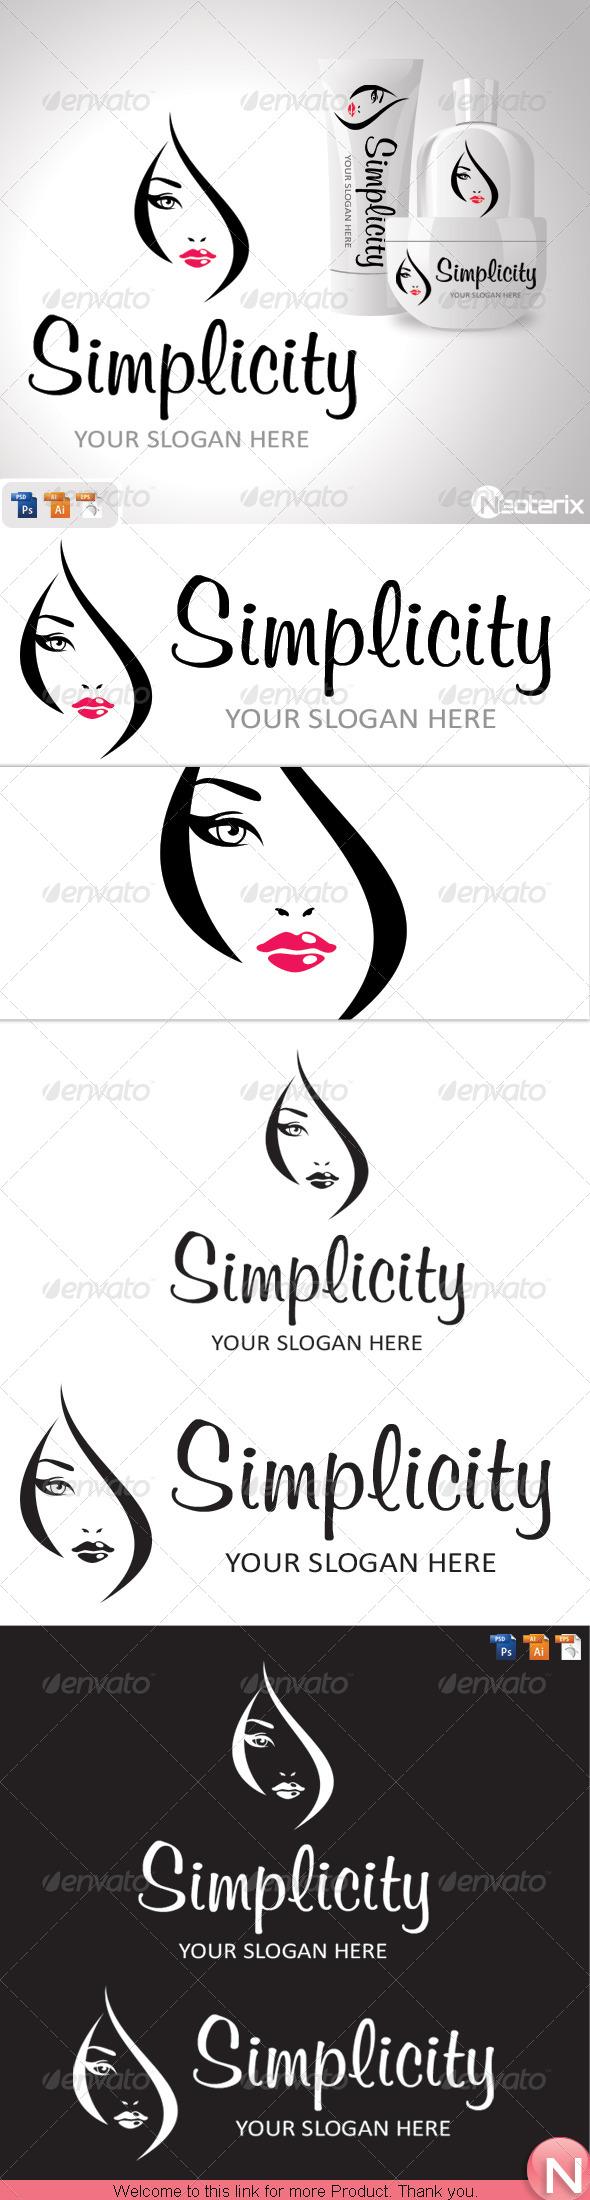 Simpalicity